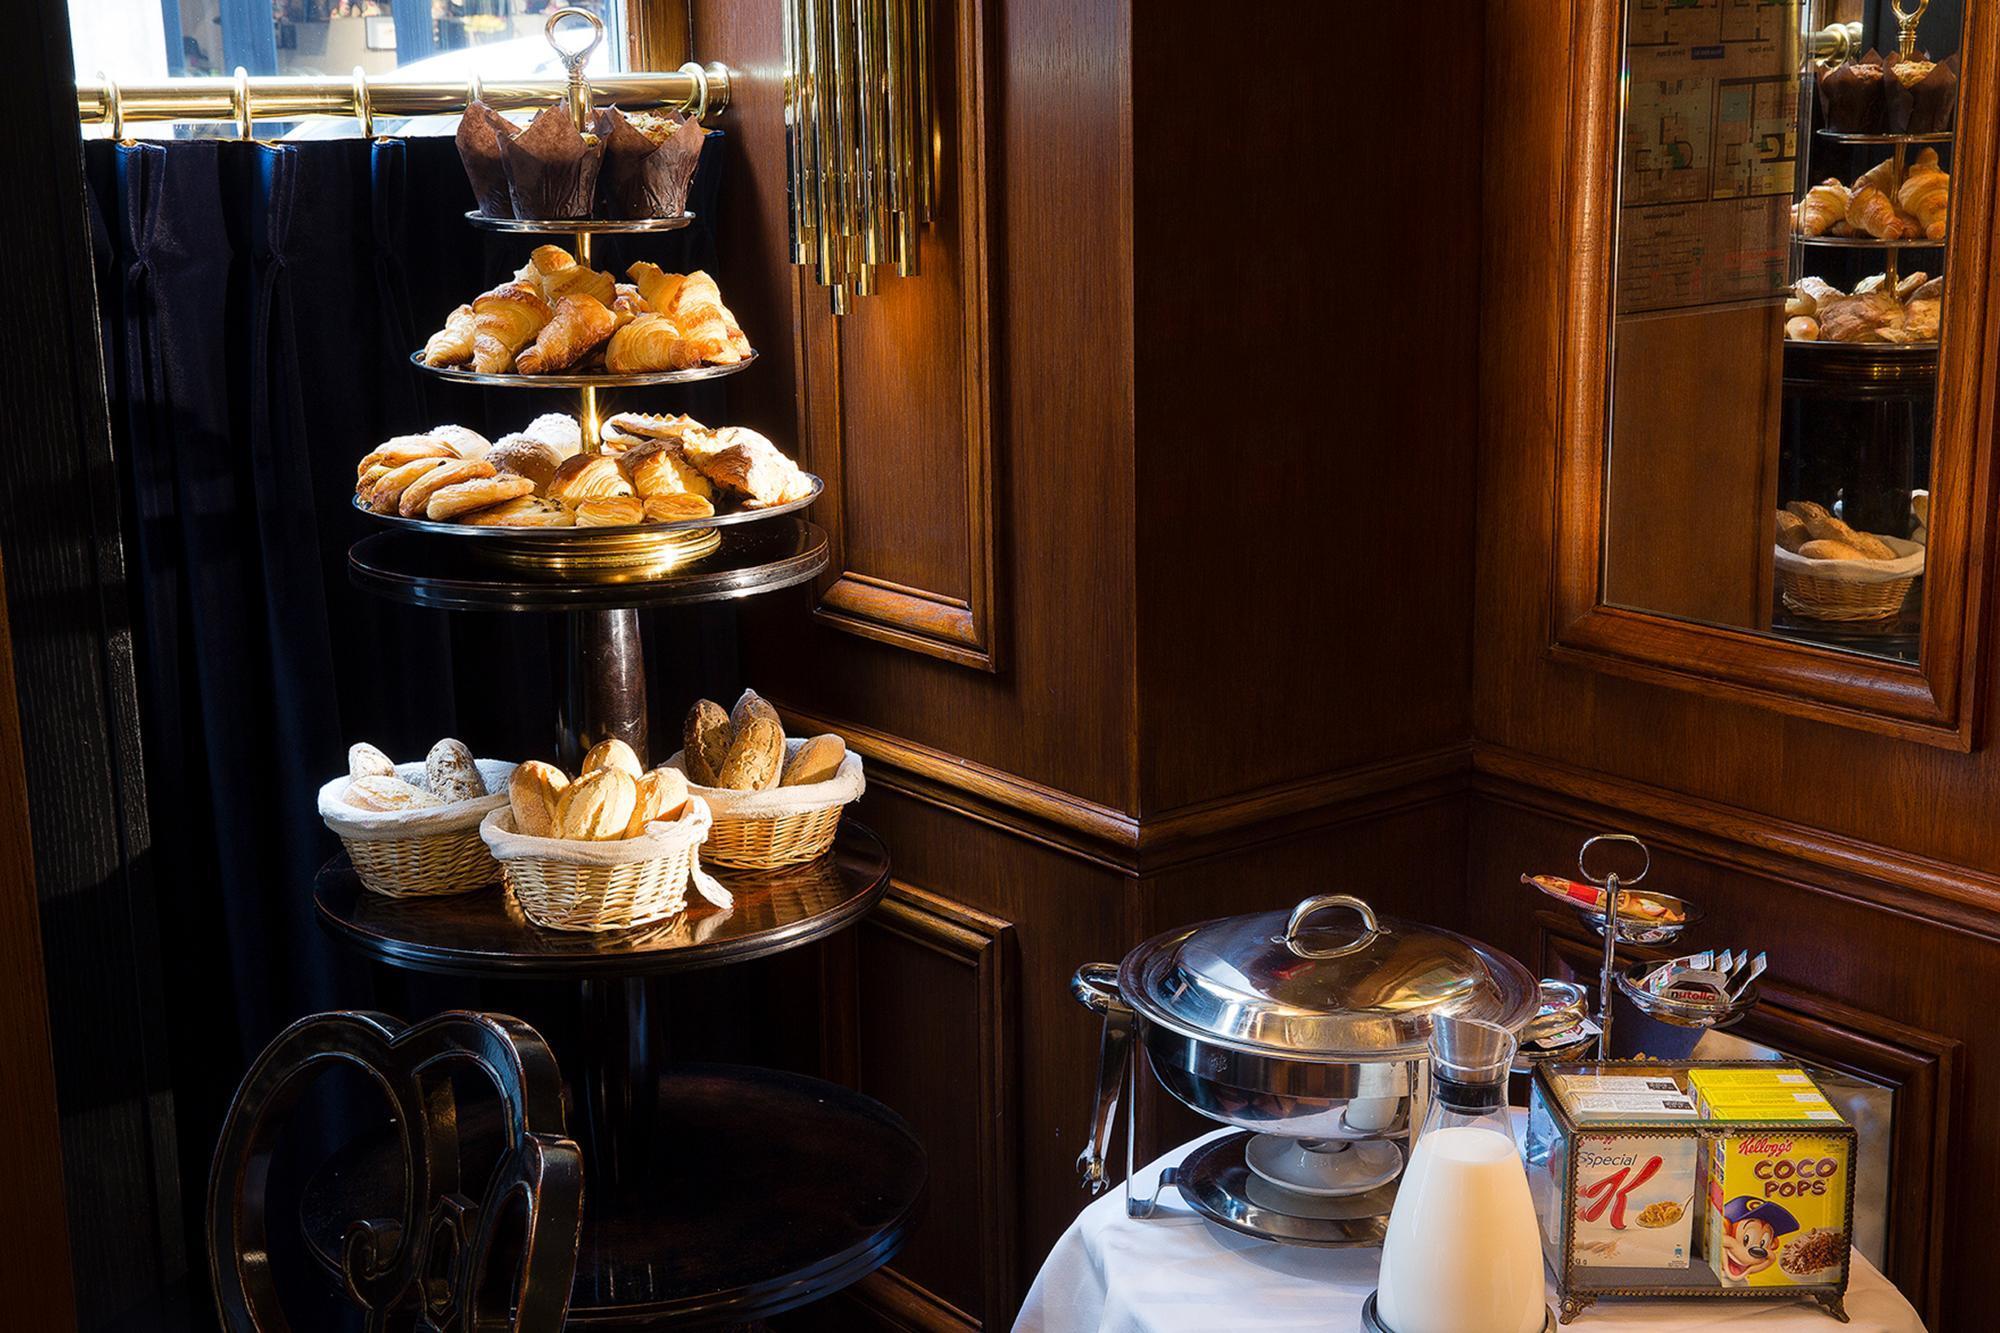 Hotel Da Vinci Breakfast buffet